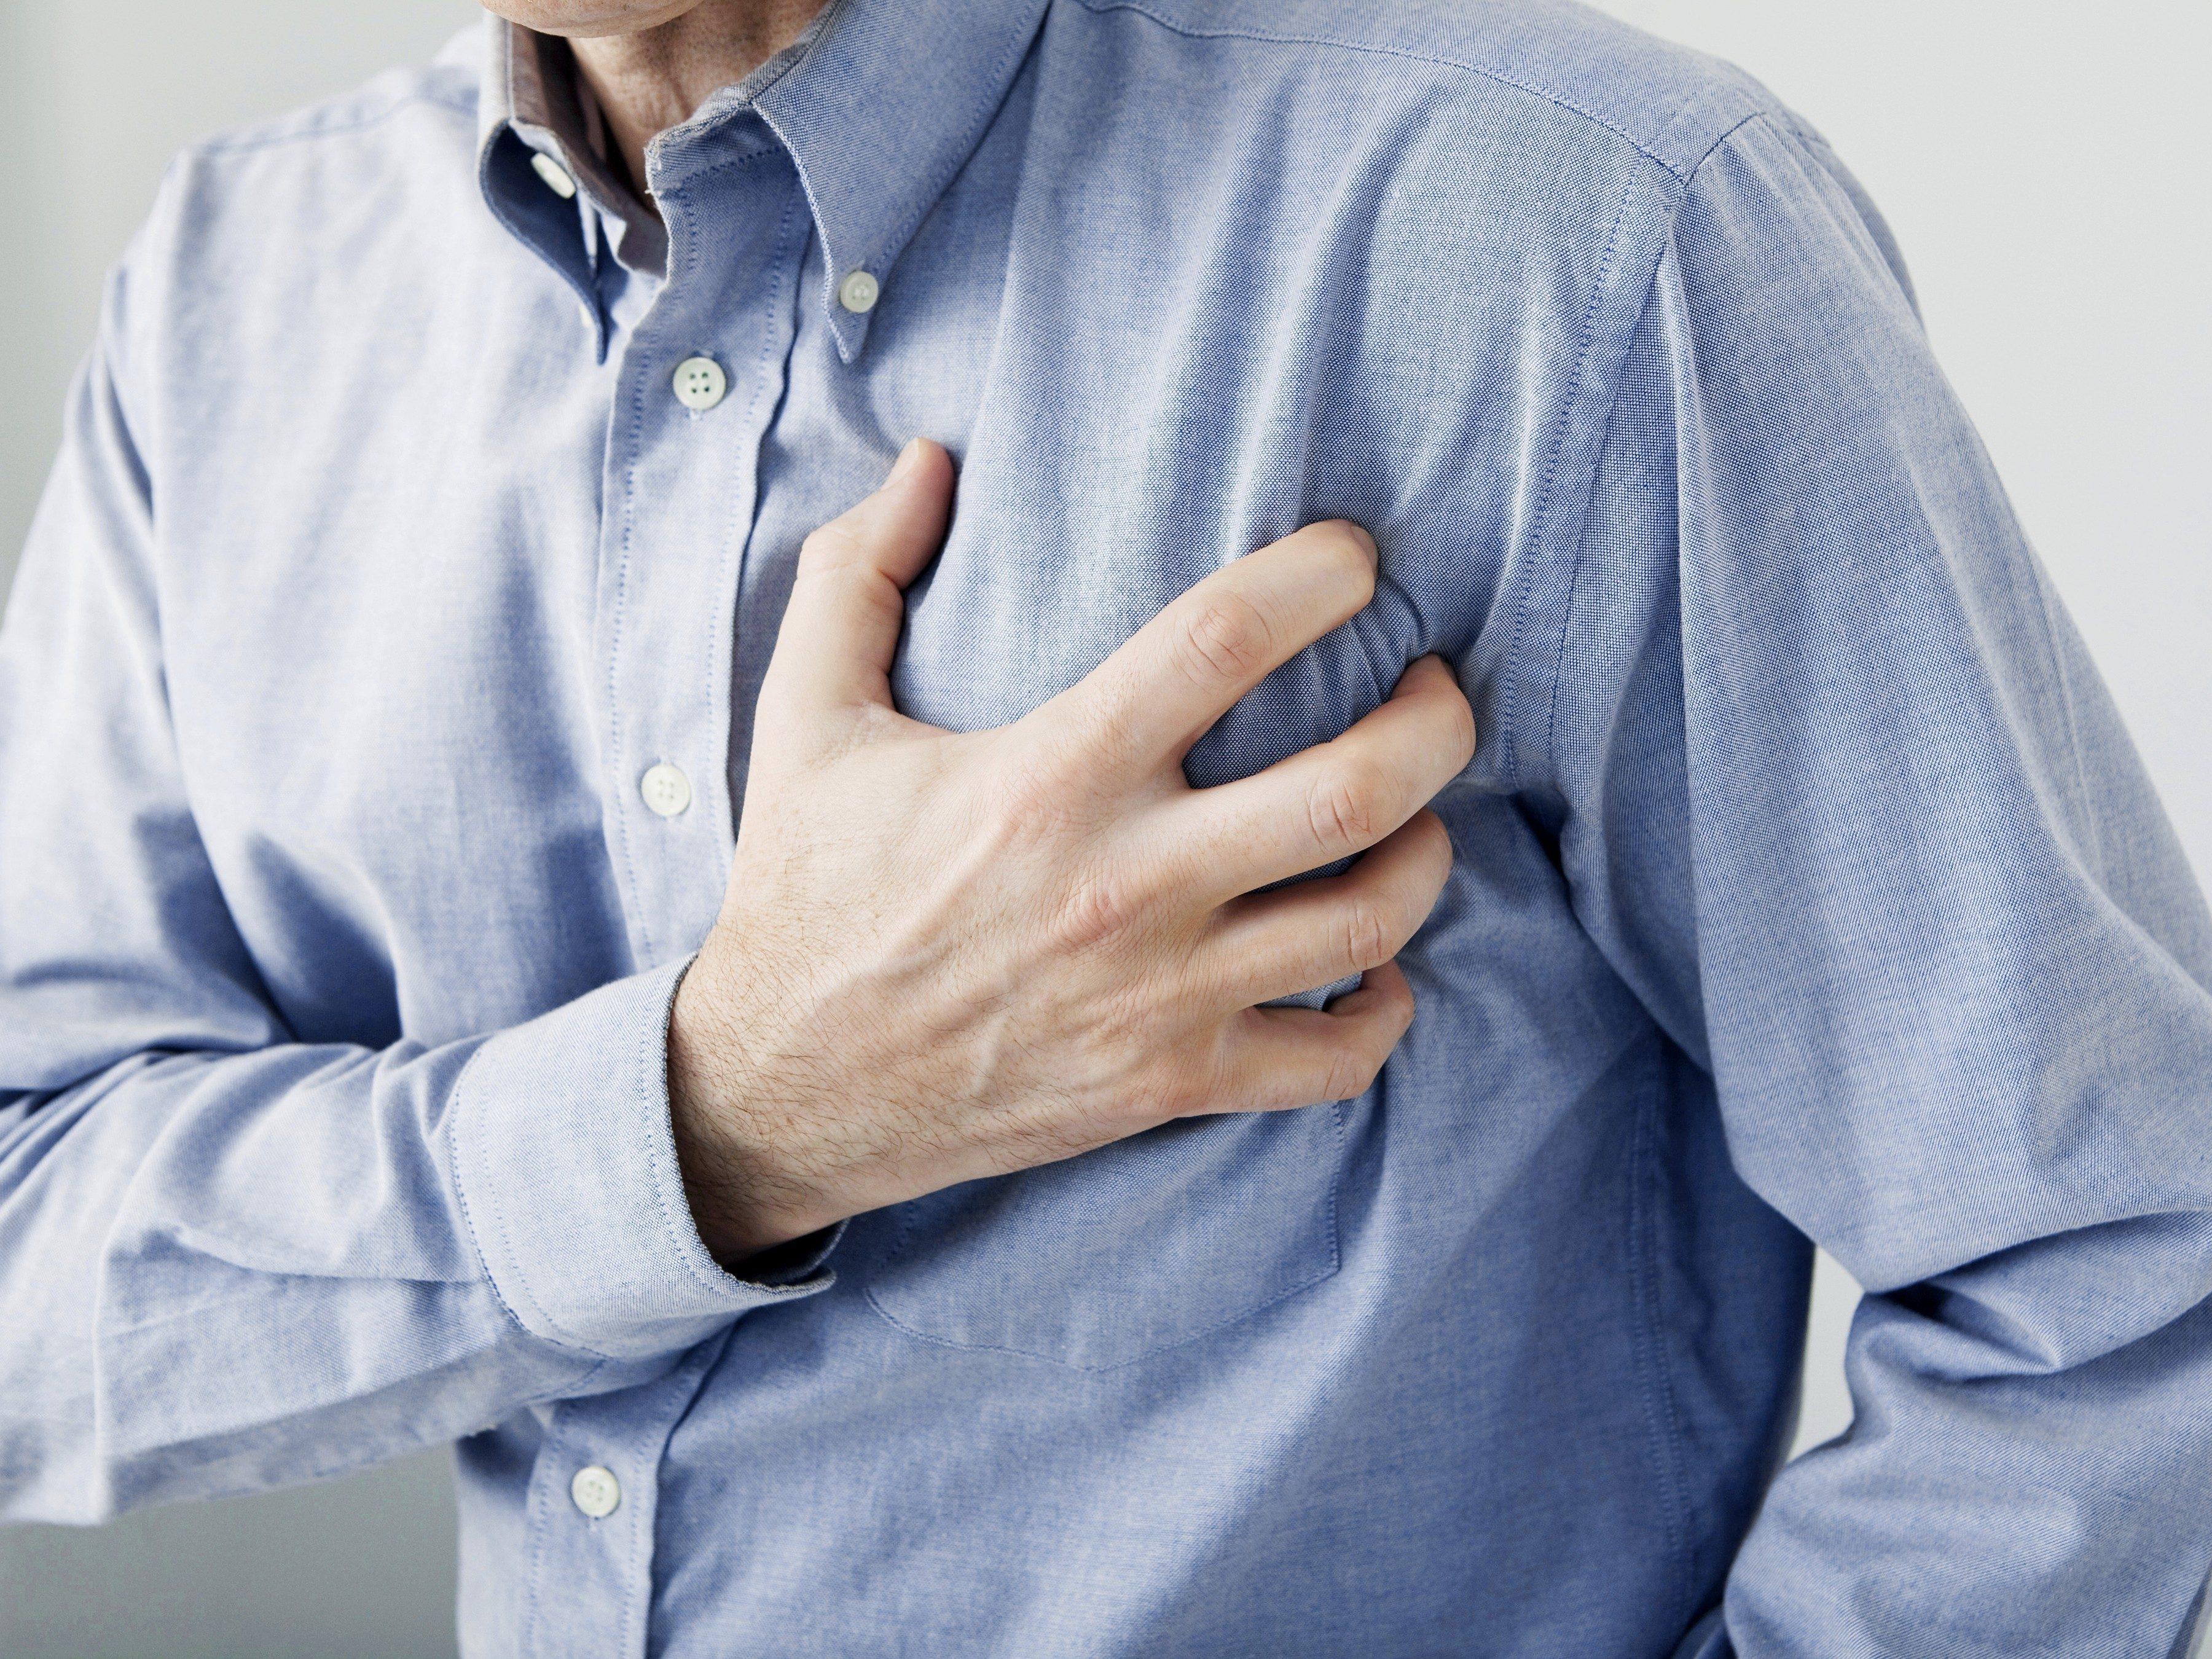 5. Heart Attack